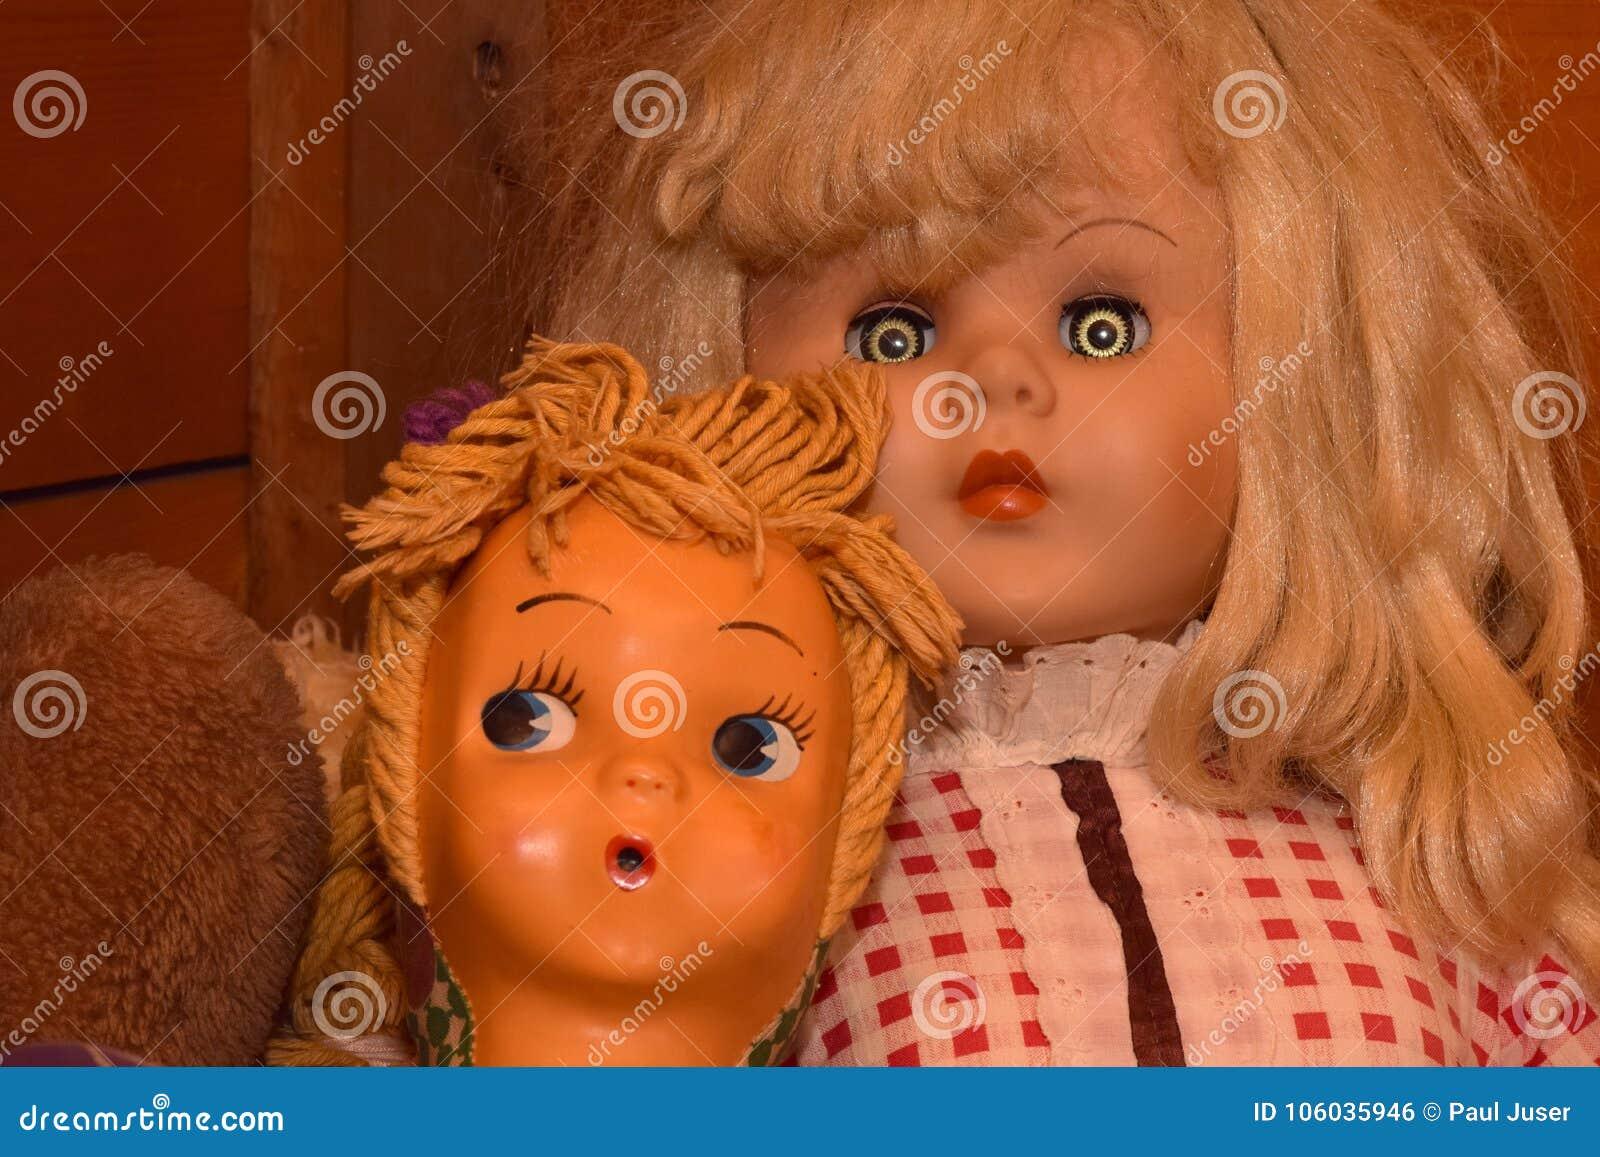 dolls with creepy eyes stock photo. image of vintage - 106035946